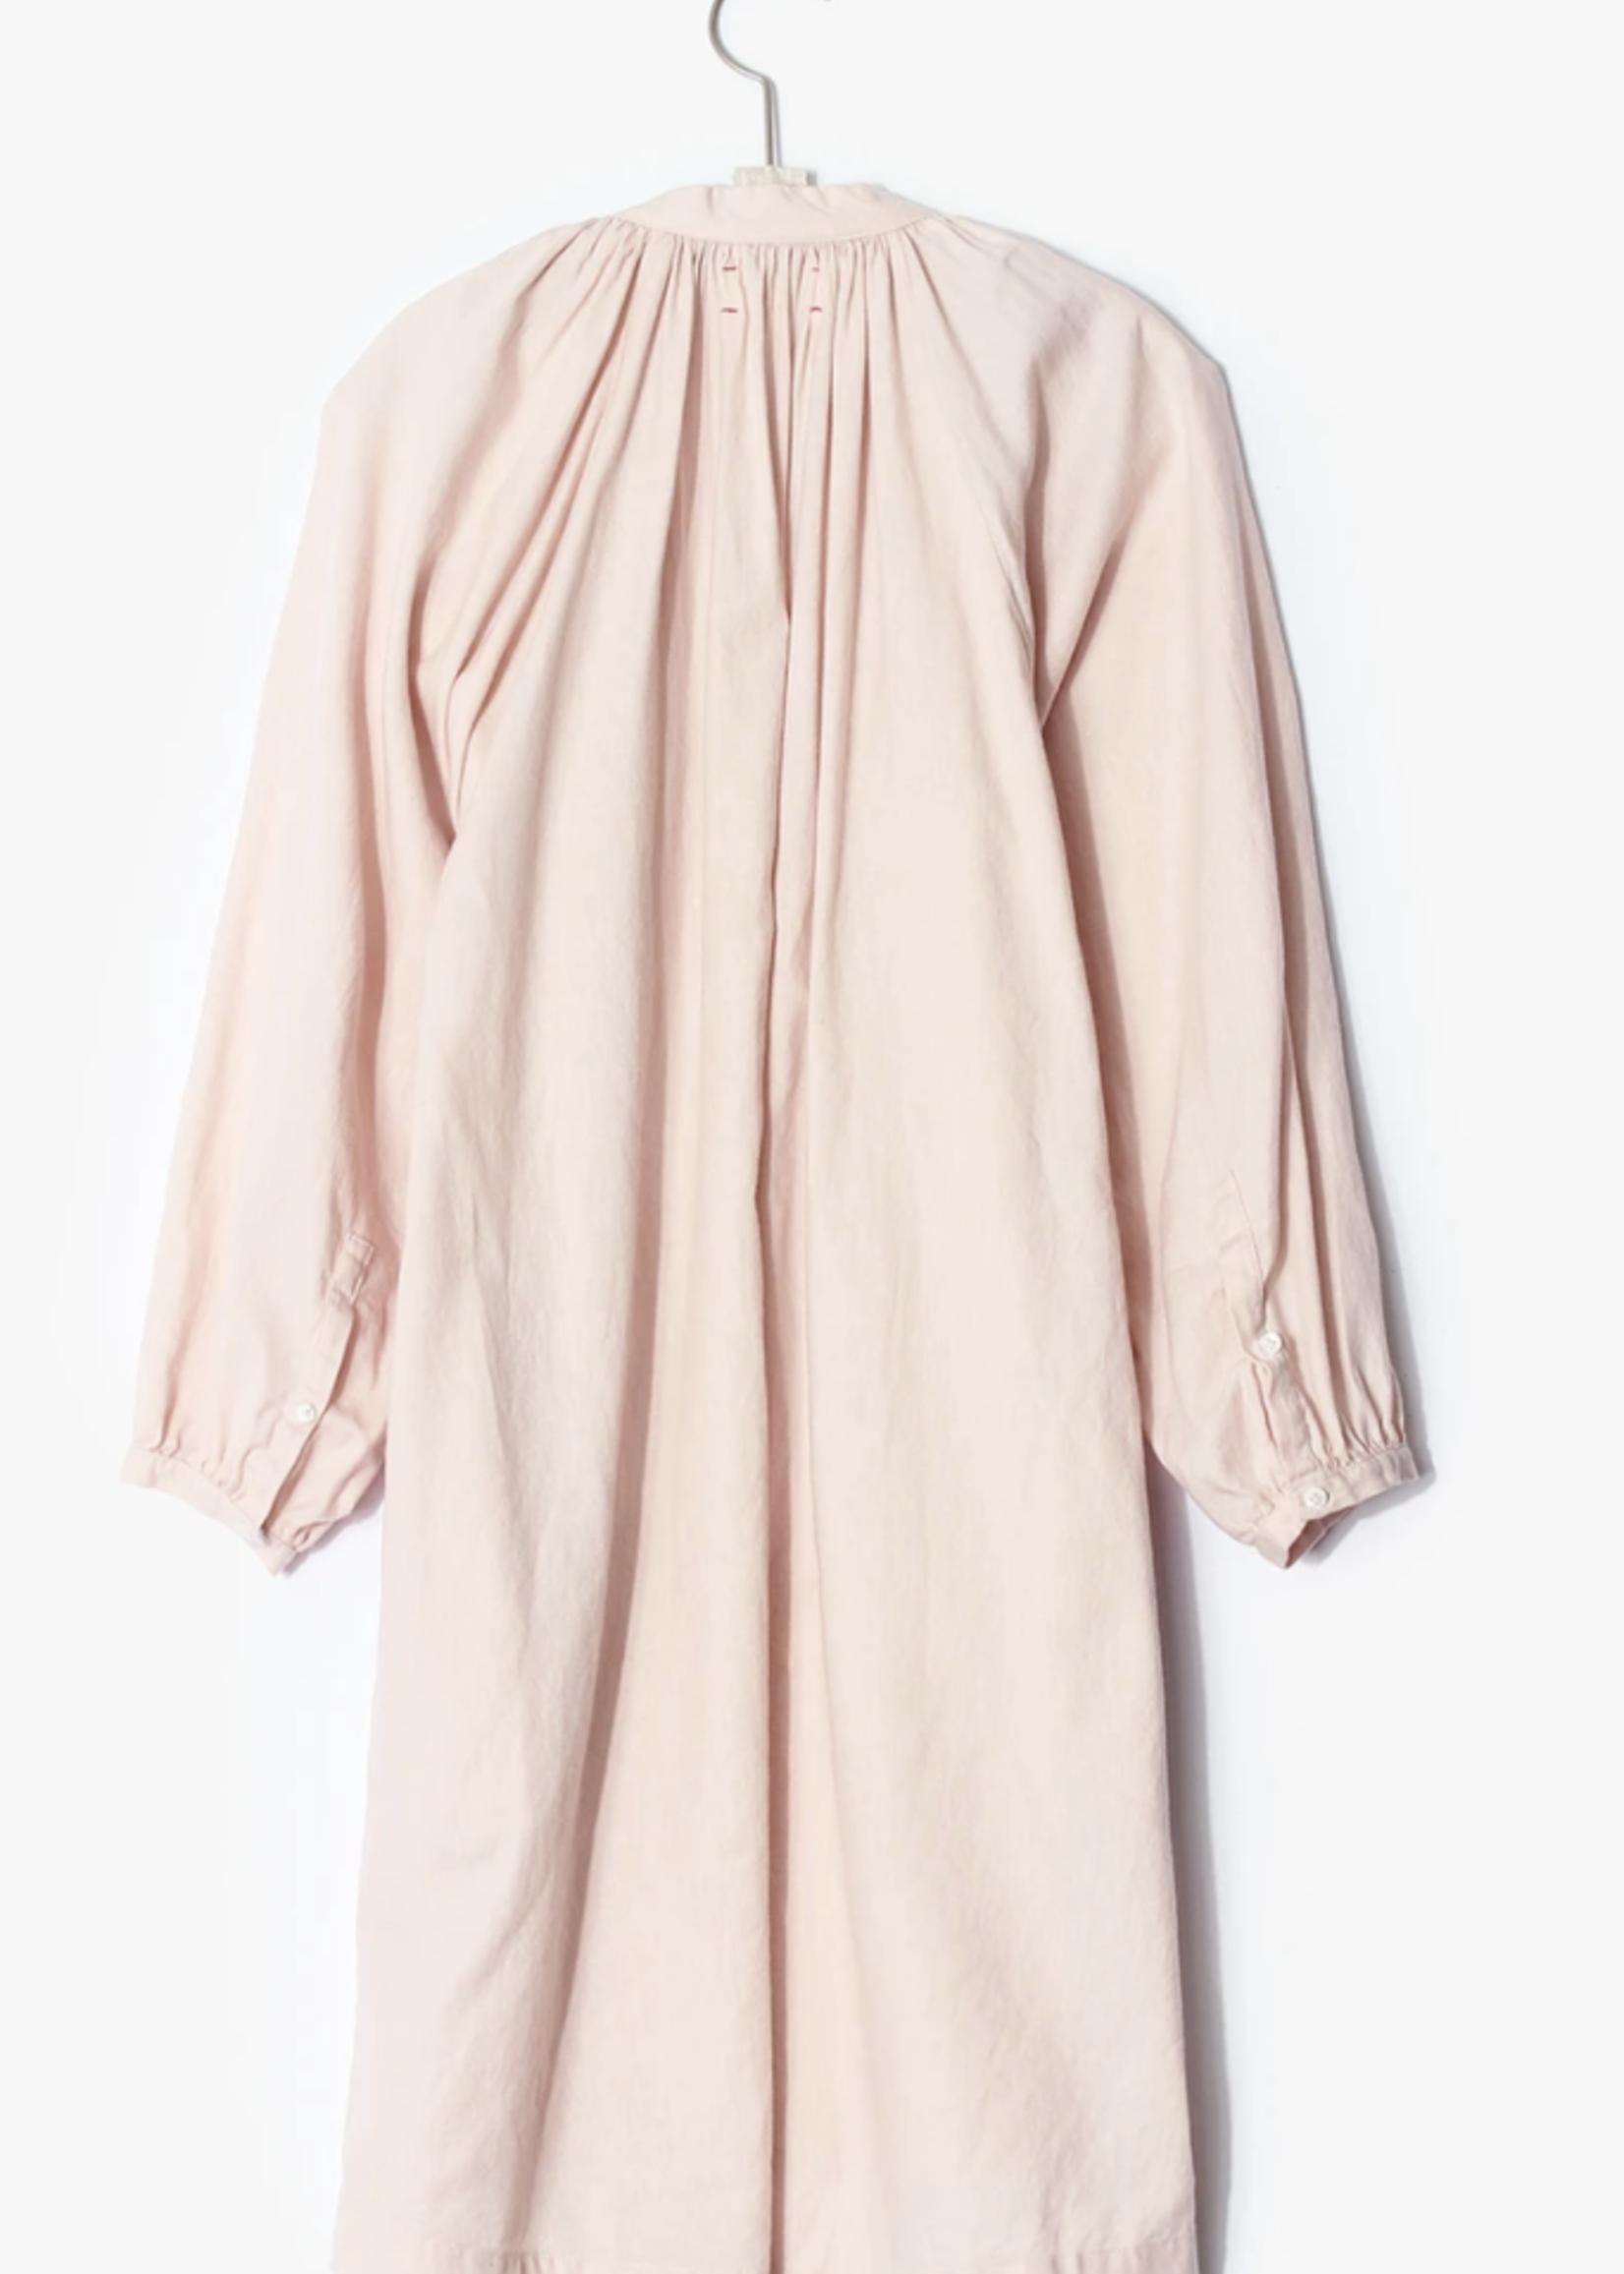 xirena xirena sabrine dress pink stone